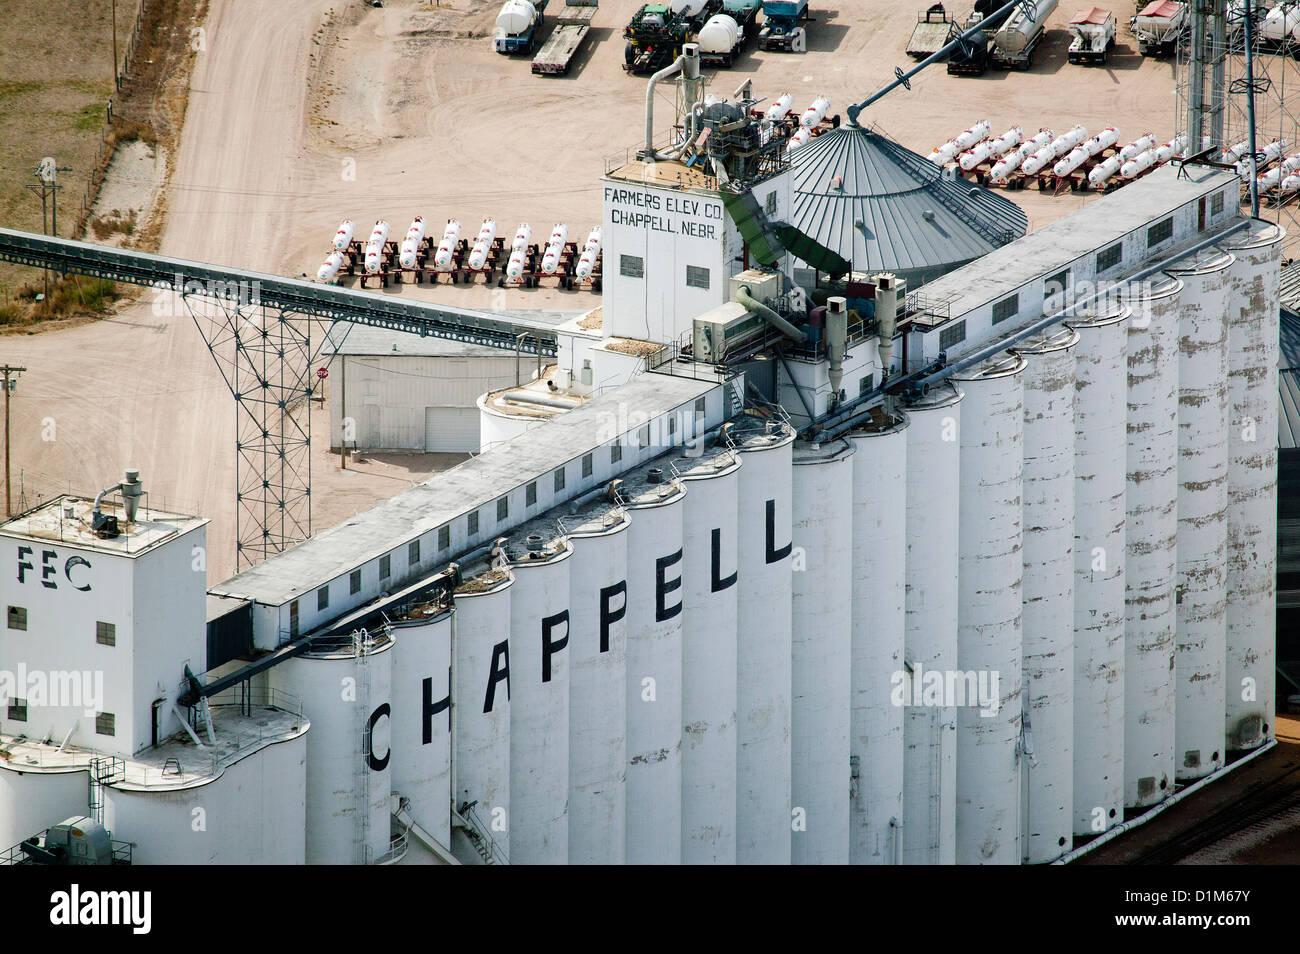 aerial photograph Farmers Elevator Company, Chappell, Nebraska - Stock Image